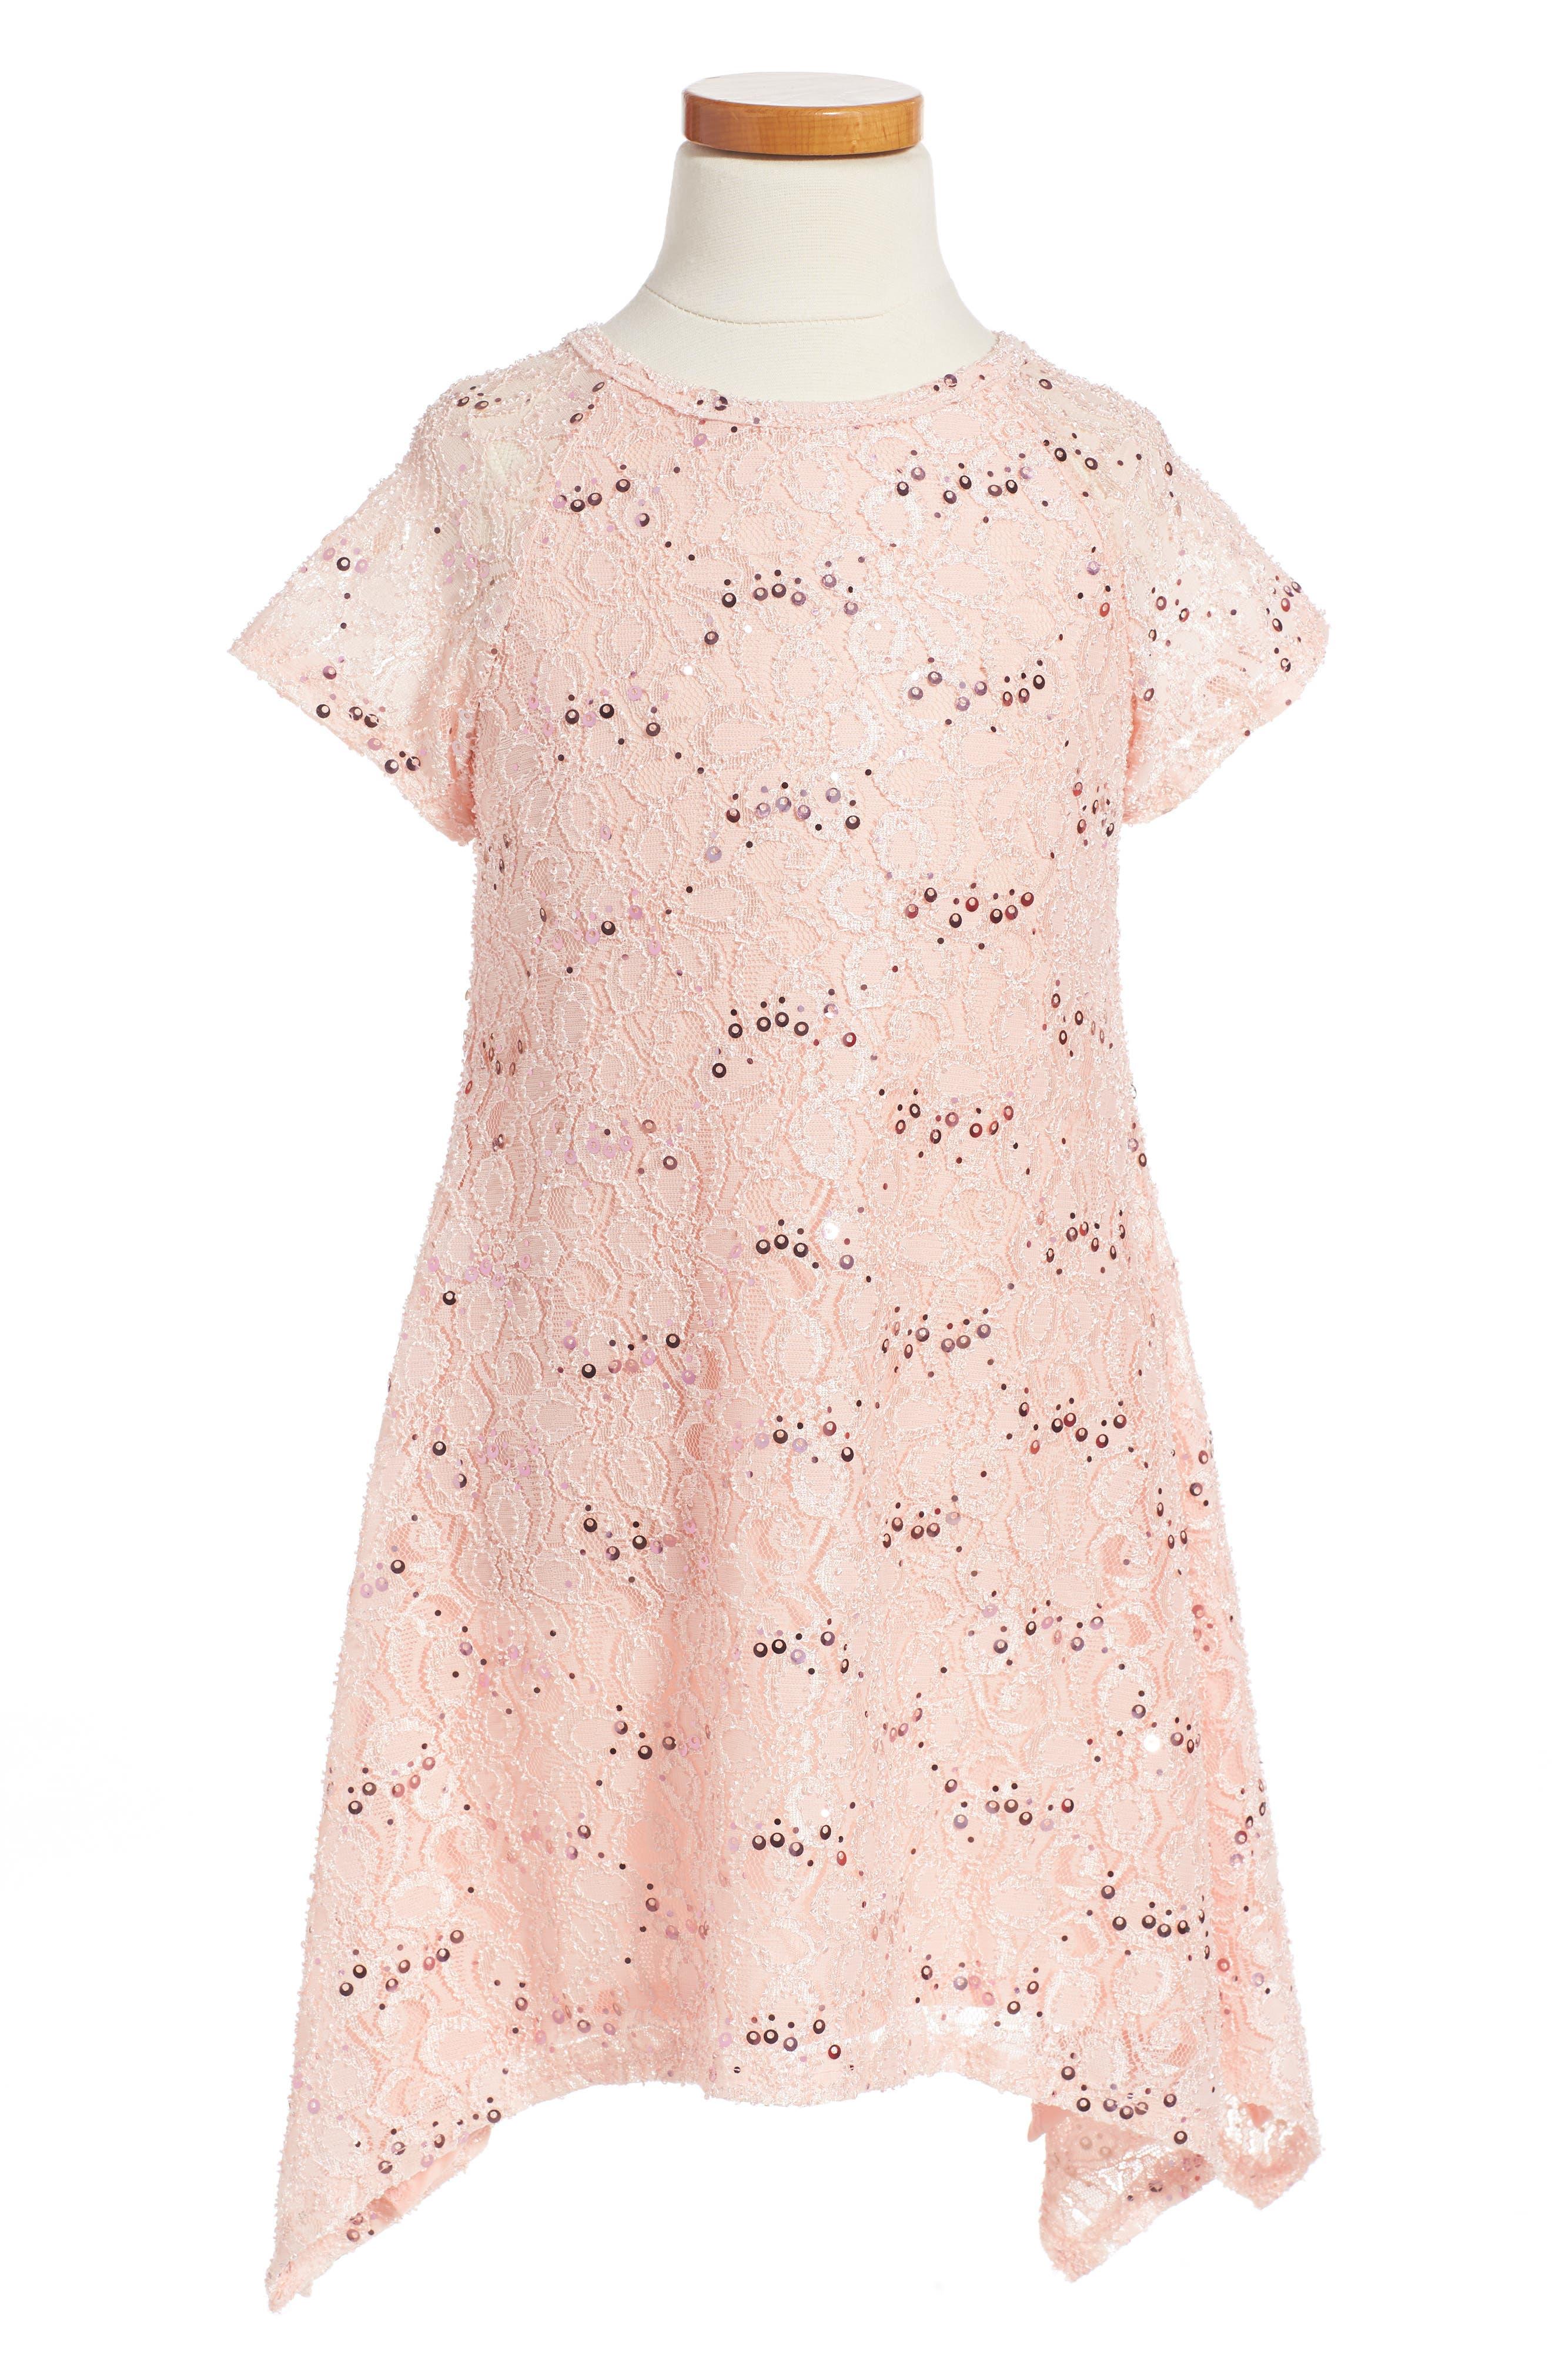 Main Image - Twirls & Twigs Lace Sequin Dress (Toddler Girls, Little Girls & Big Girls)